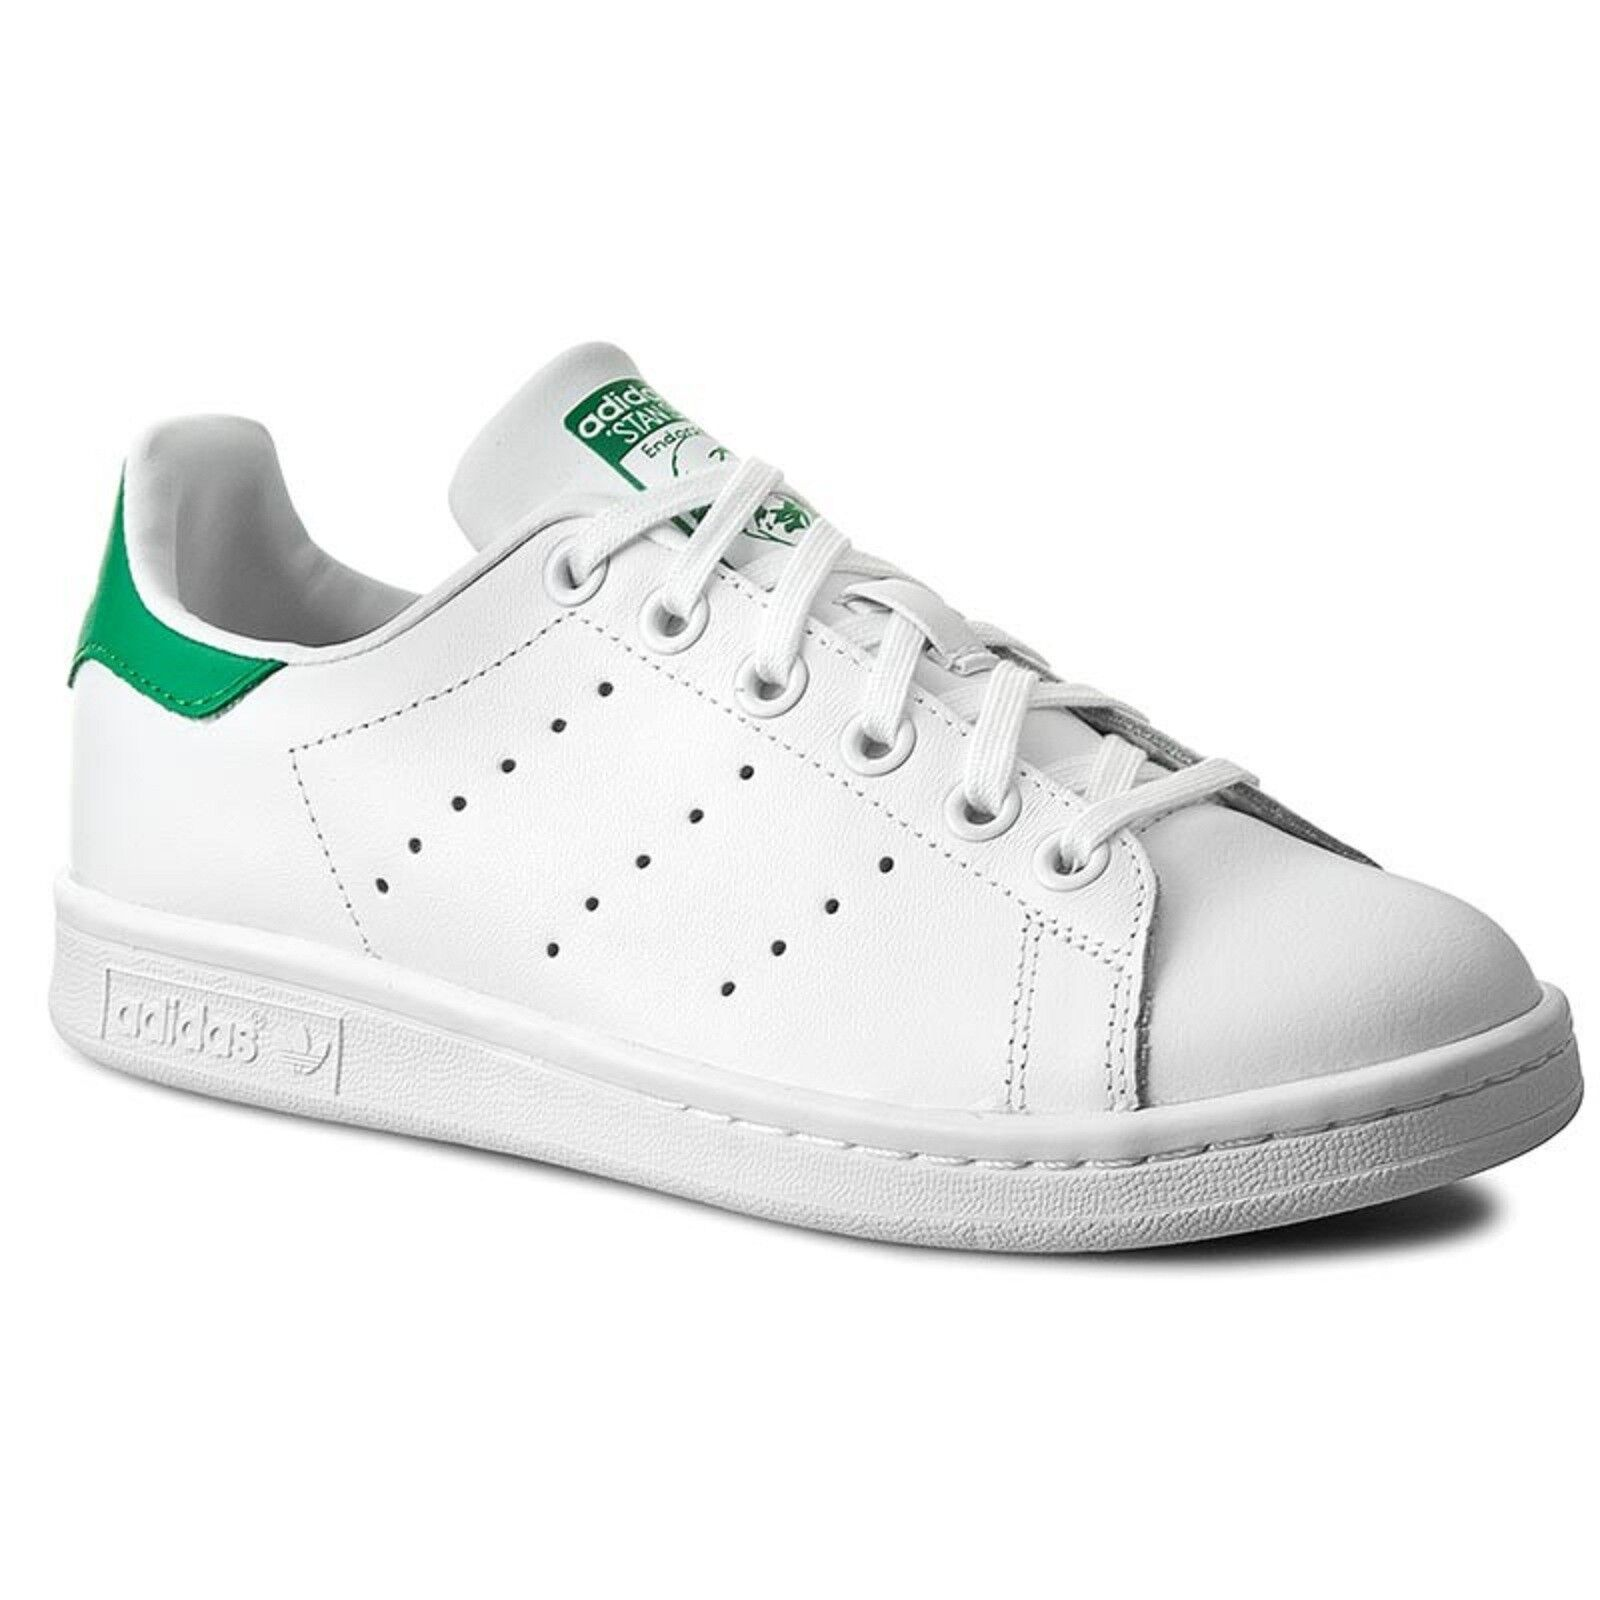 ADIDAS Stan Smith Bianco Bianco Bianco verde blanco verde zapatilla de deporte Man hombres zapatos da ginnastica  envío gratuito a nivel mundial